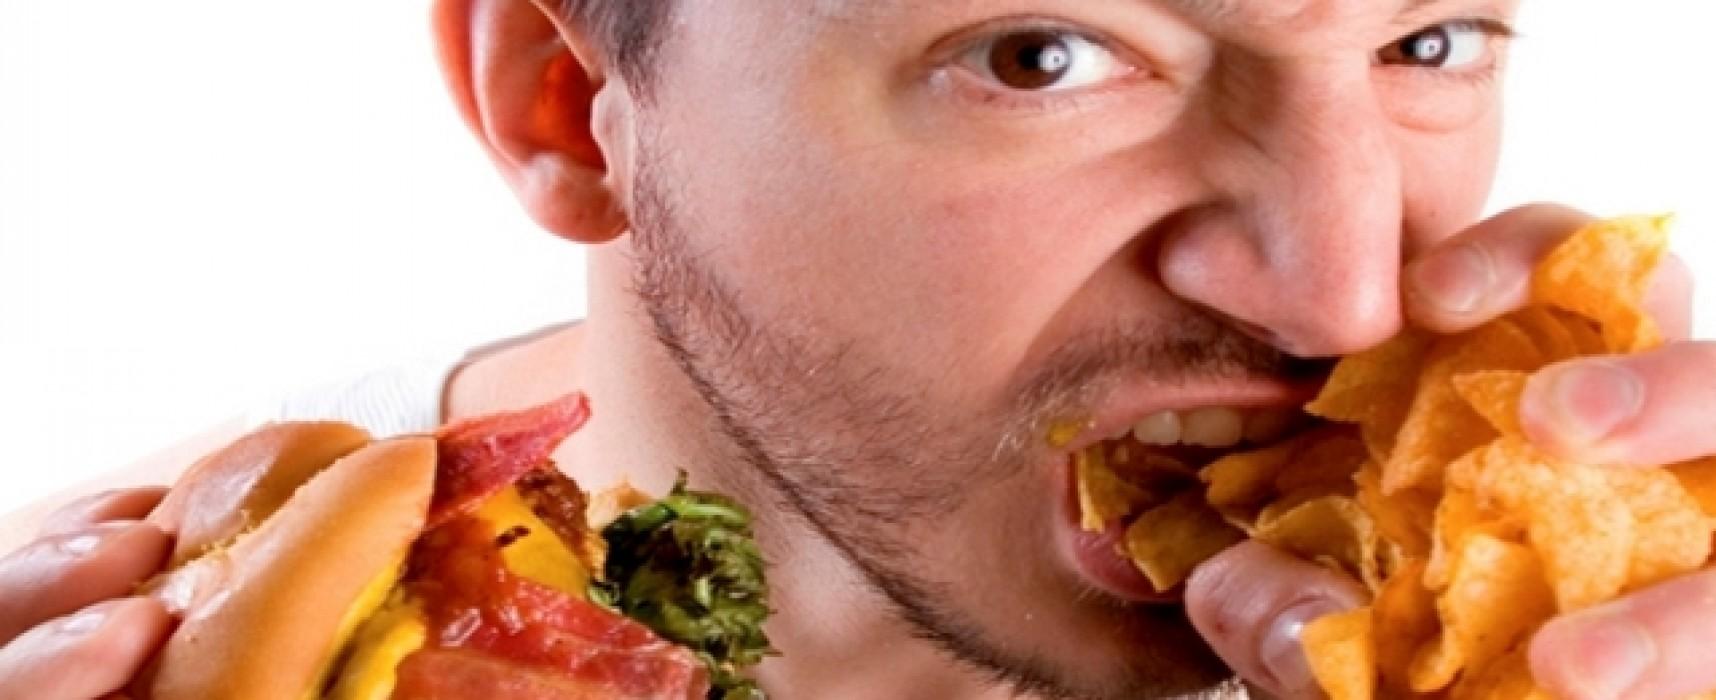 Food Addiction: Sign, Symptoms and Treatment